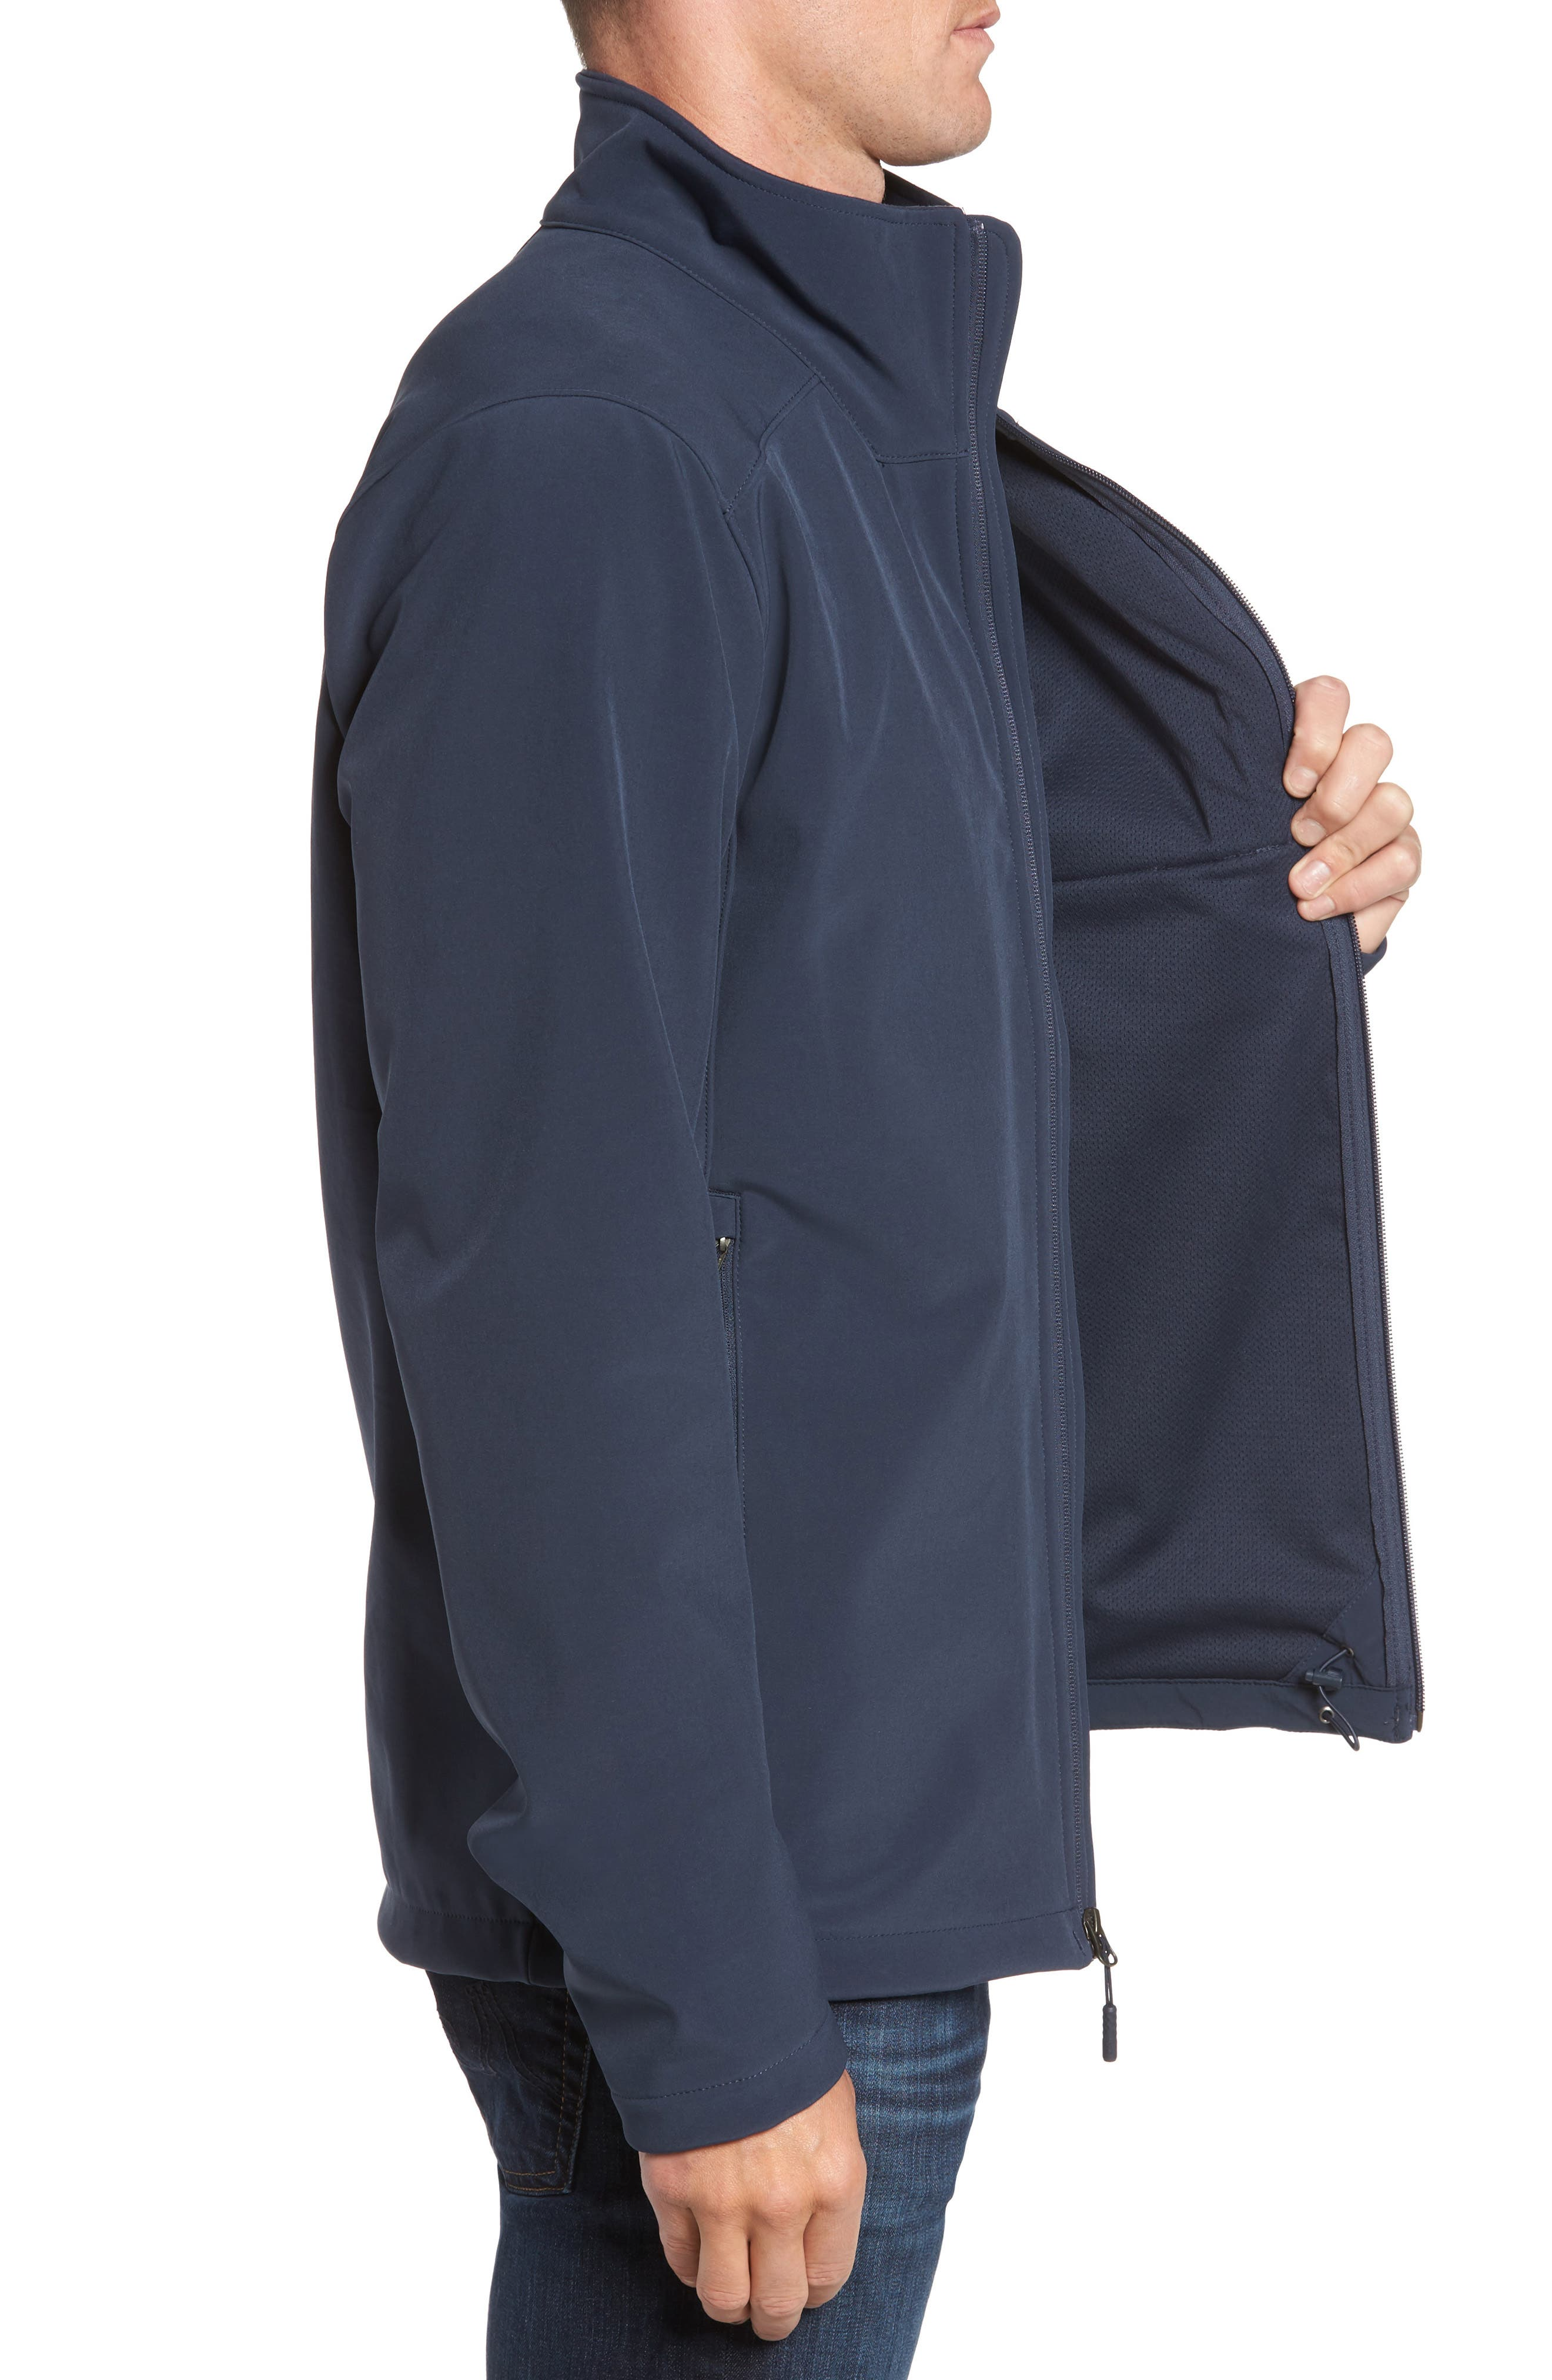 Apex Bionic 2 Water Repellent Jacket,                             Alternate thumbnail 3, color,                             Blue